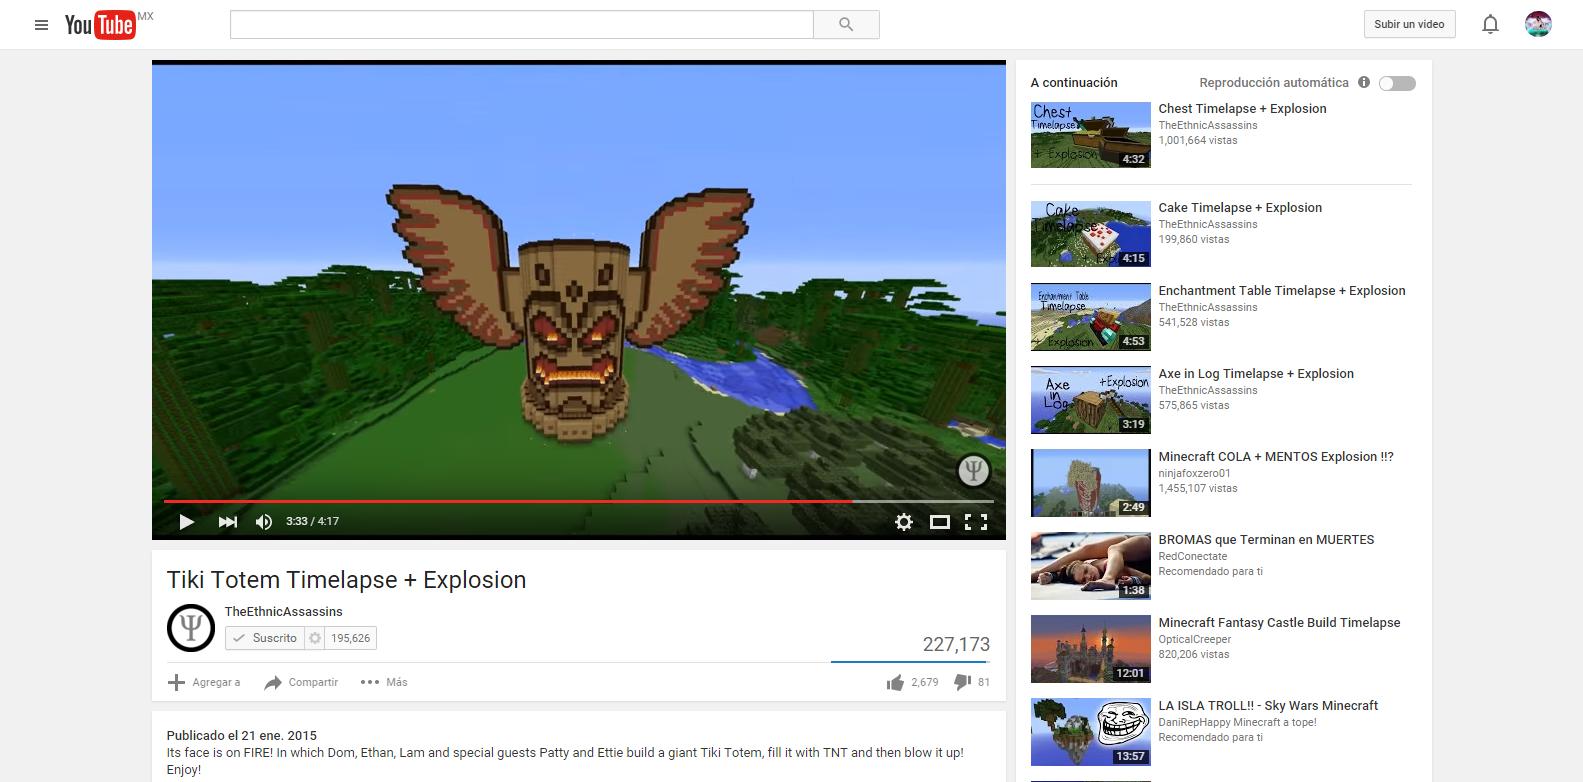 Tiki Totem Timelapse   Explosion   YouTube.